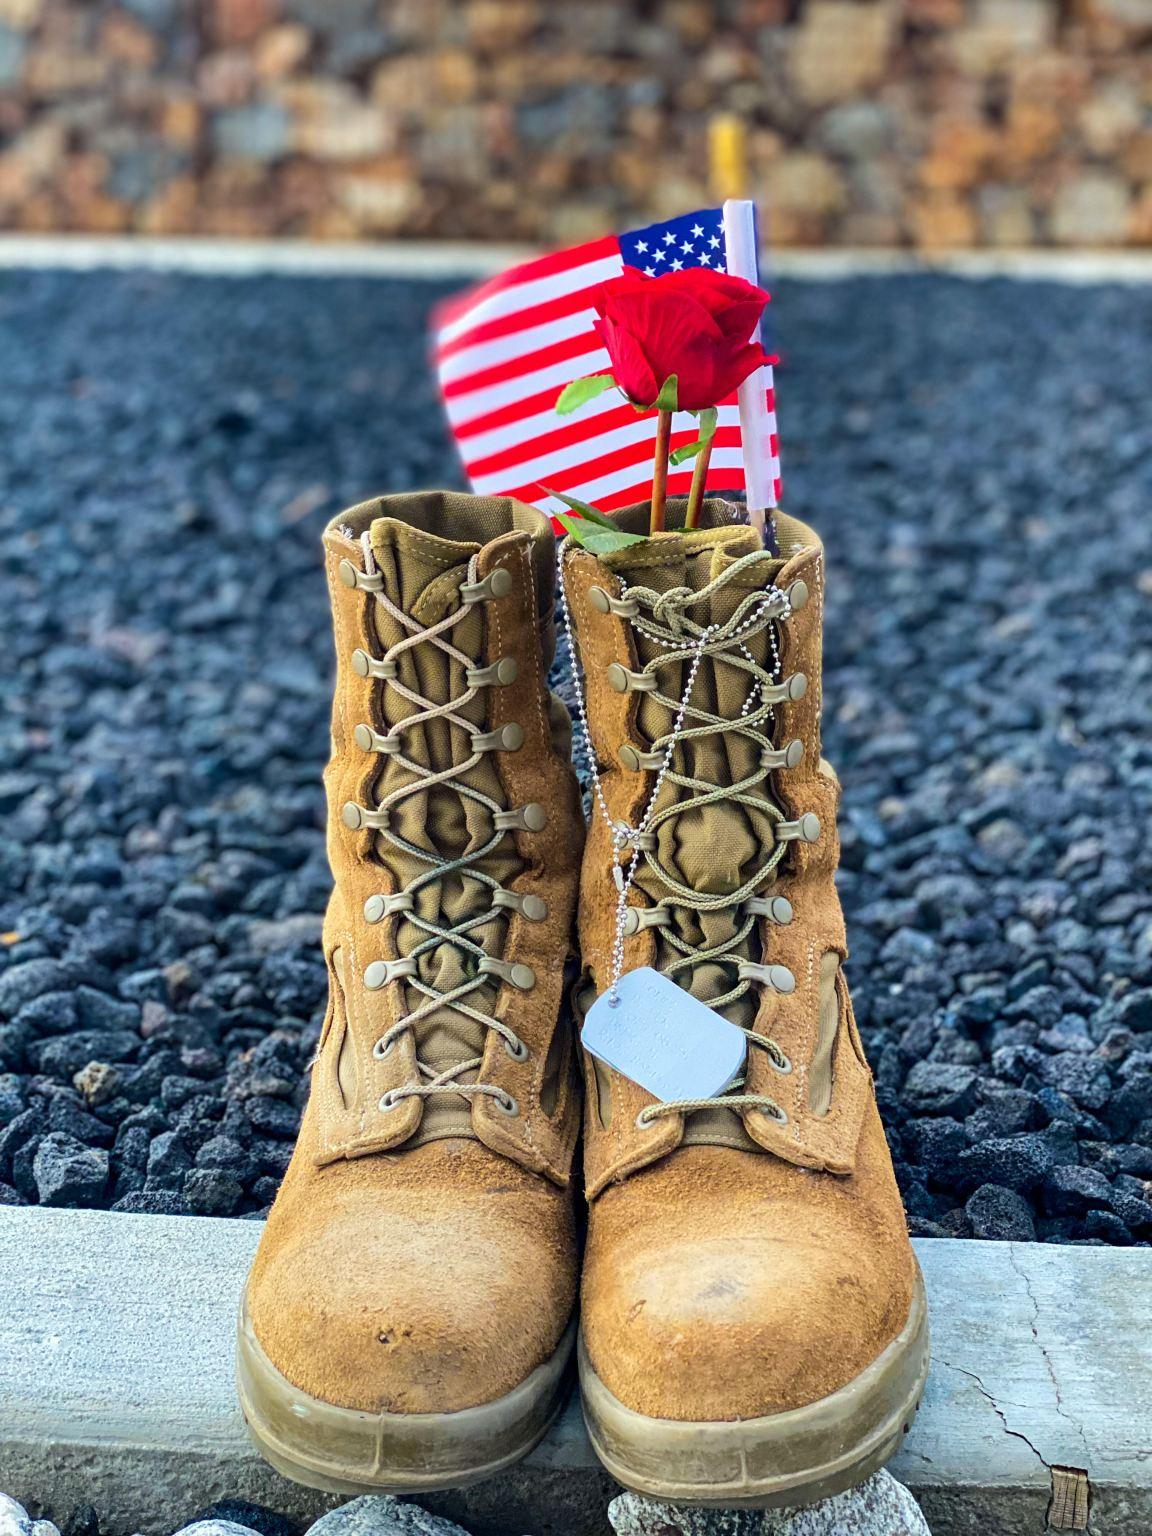 29 Palms Marine Base Community Honer Fallen U.S. Marines